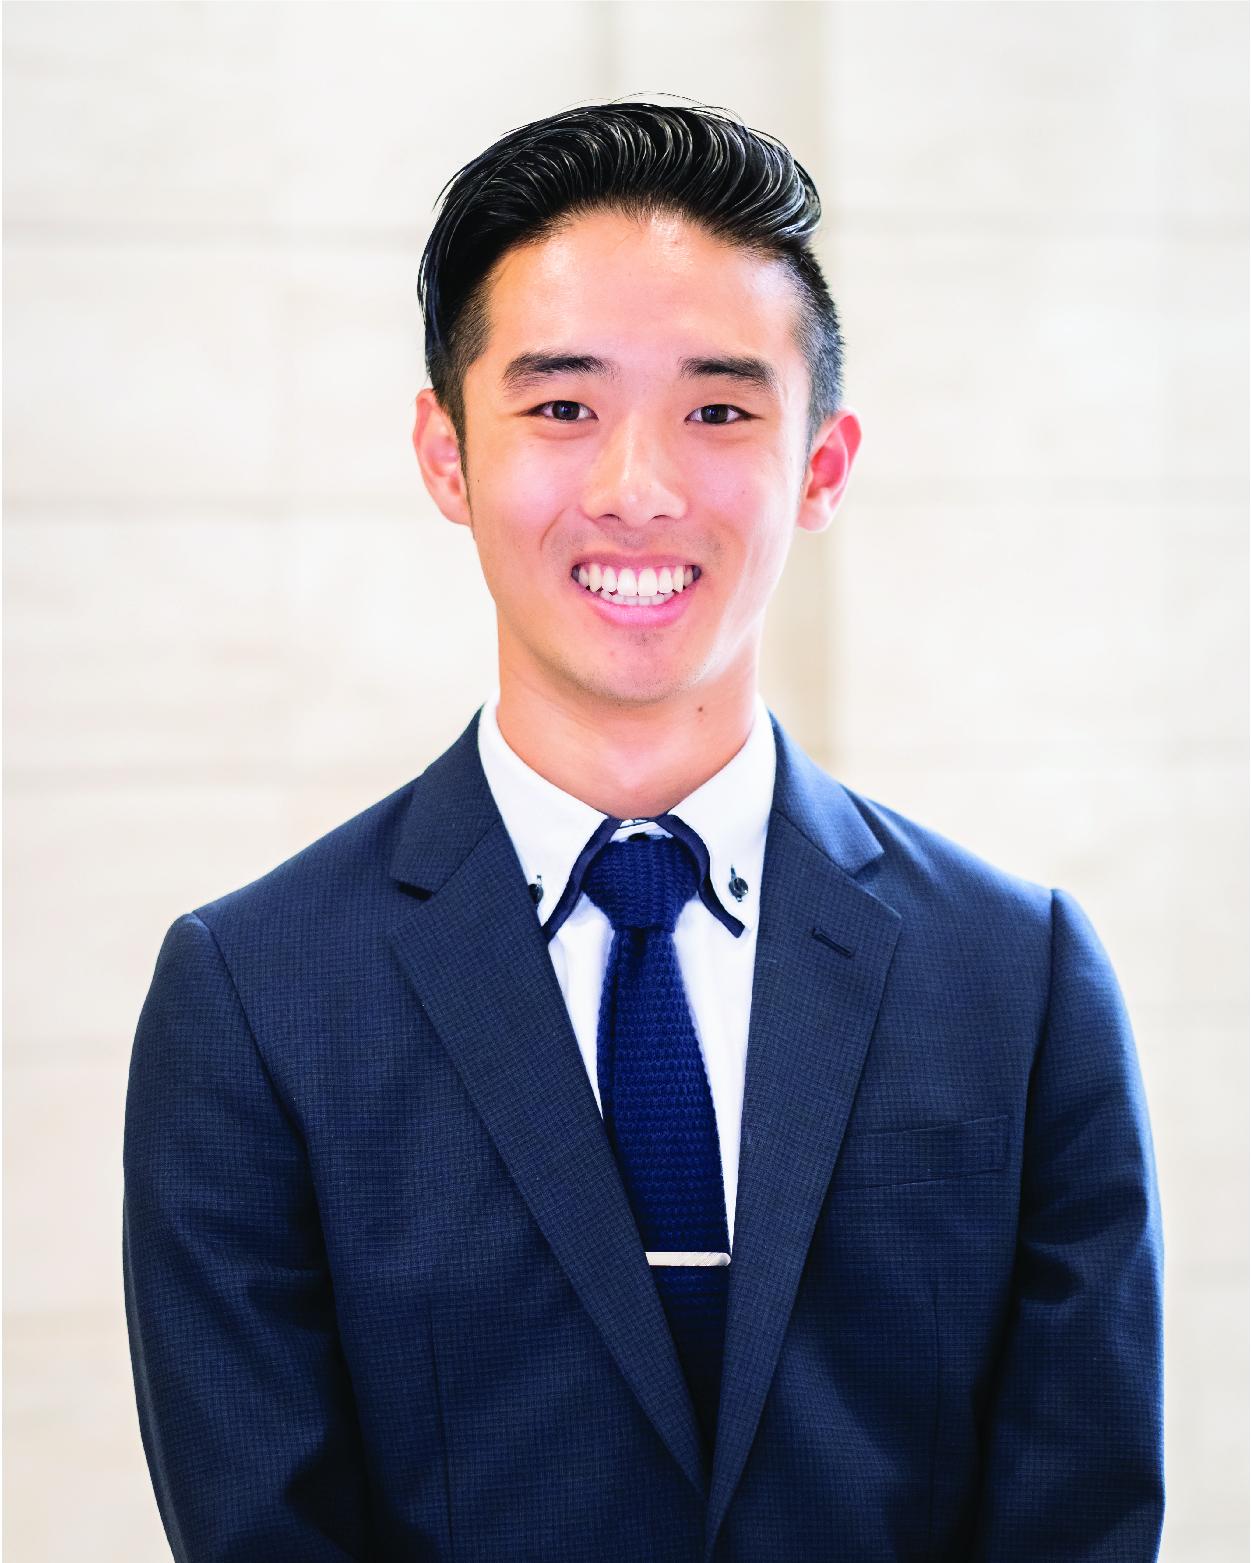 Matthew Lee  Intern at the Office of Congresswoman Judy Chu